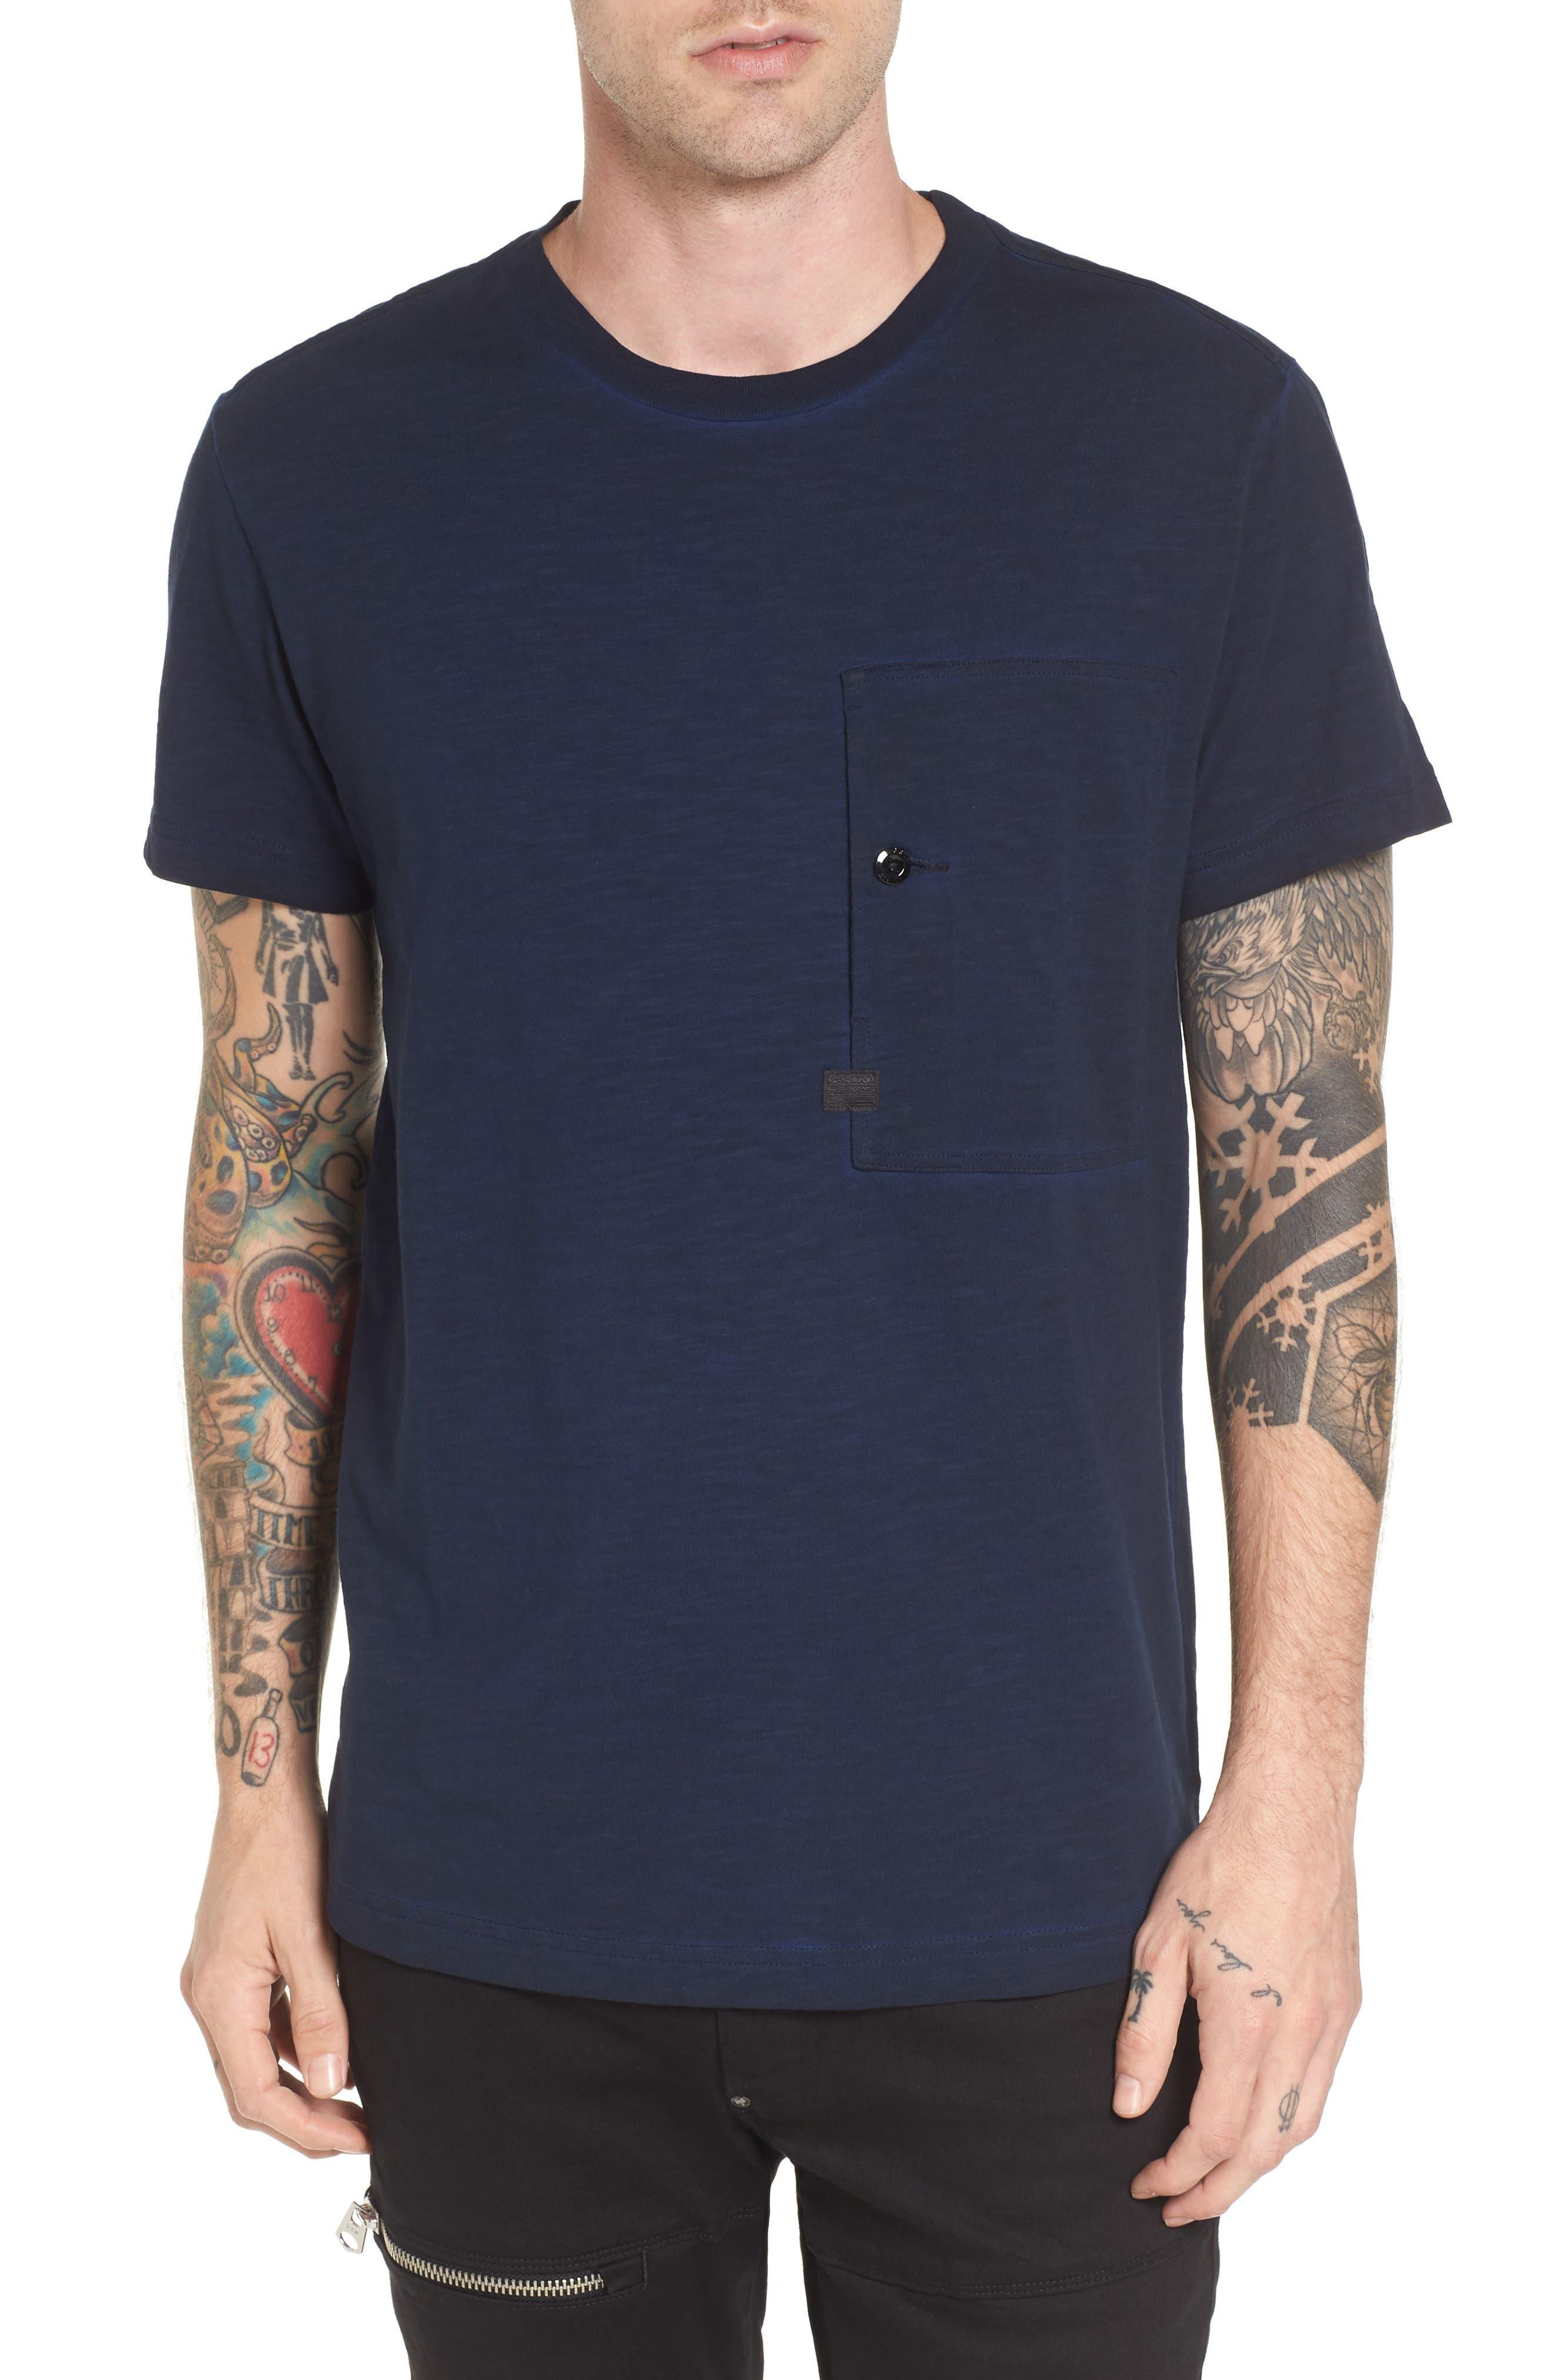 Stalt Pocket T-Shirt,                             Main thumbnail 1, color,                             400